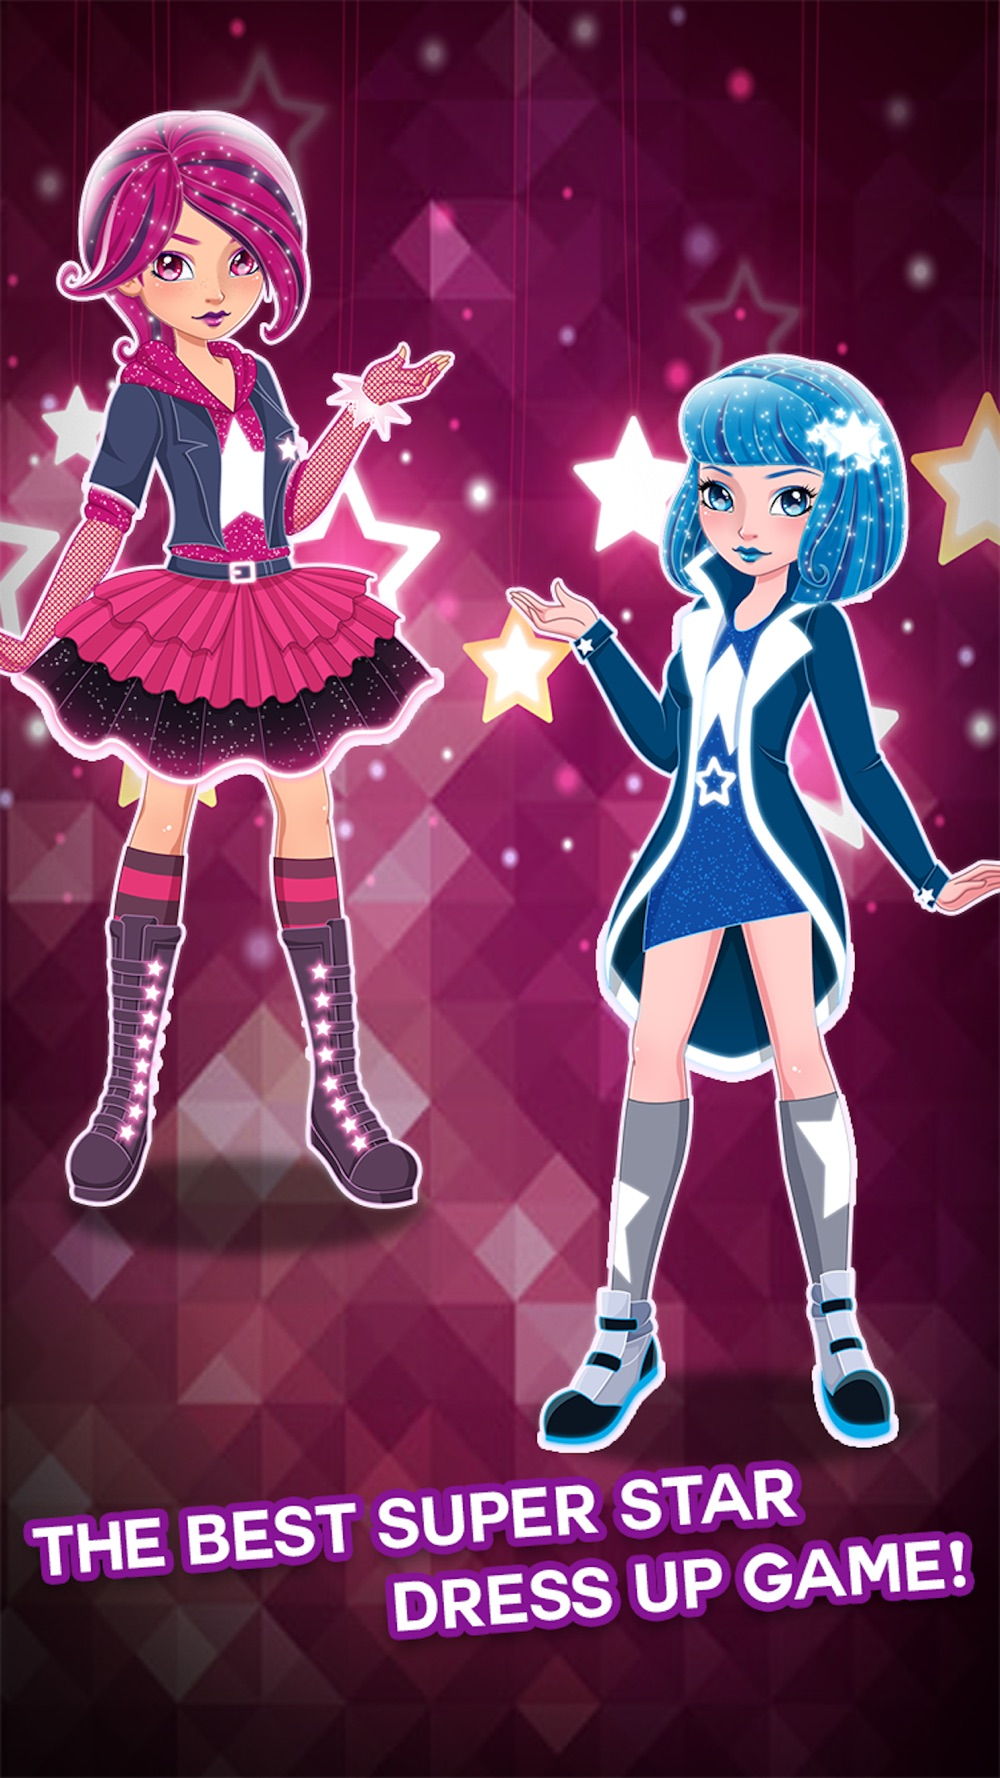 Super-Star Wish Dress-up Darling Princess Teenage hack tool